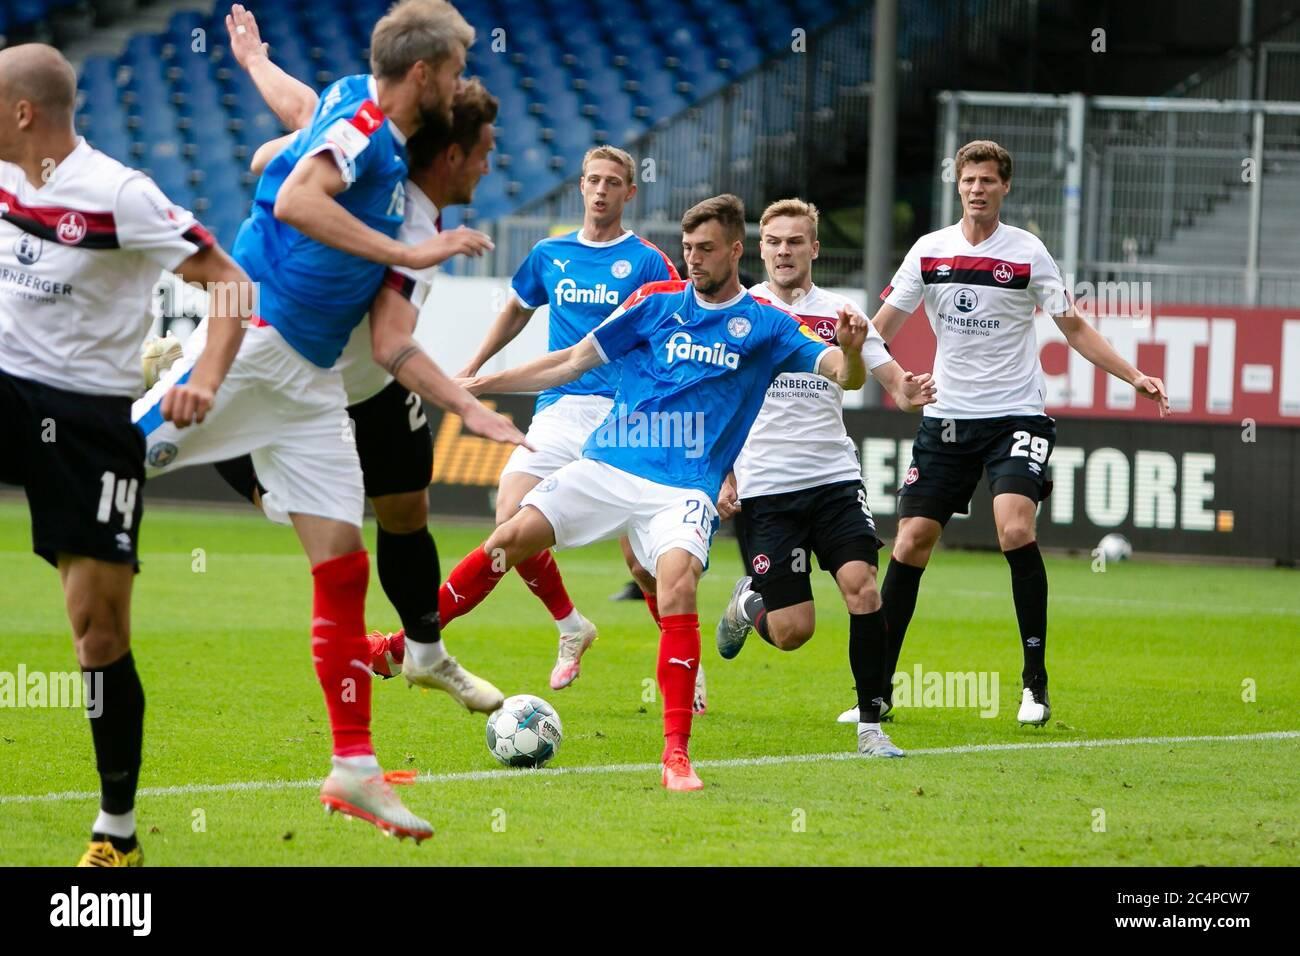 Kiel Germany 28th June 2020 Football 2nd Bundesliga Holstein Kiel 1st Fc Nuremberg 34th Matchday At